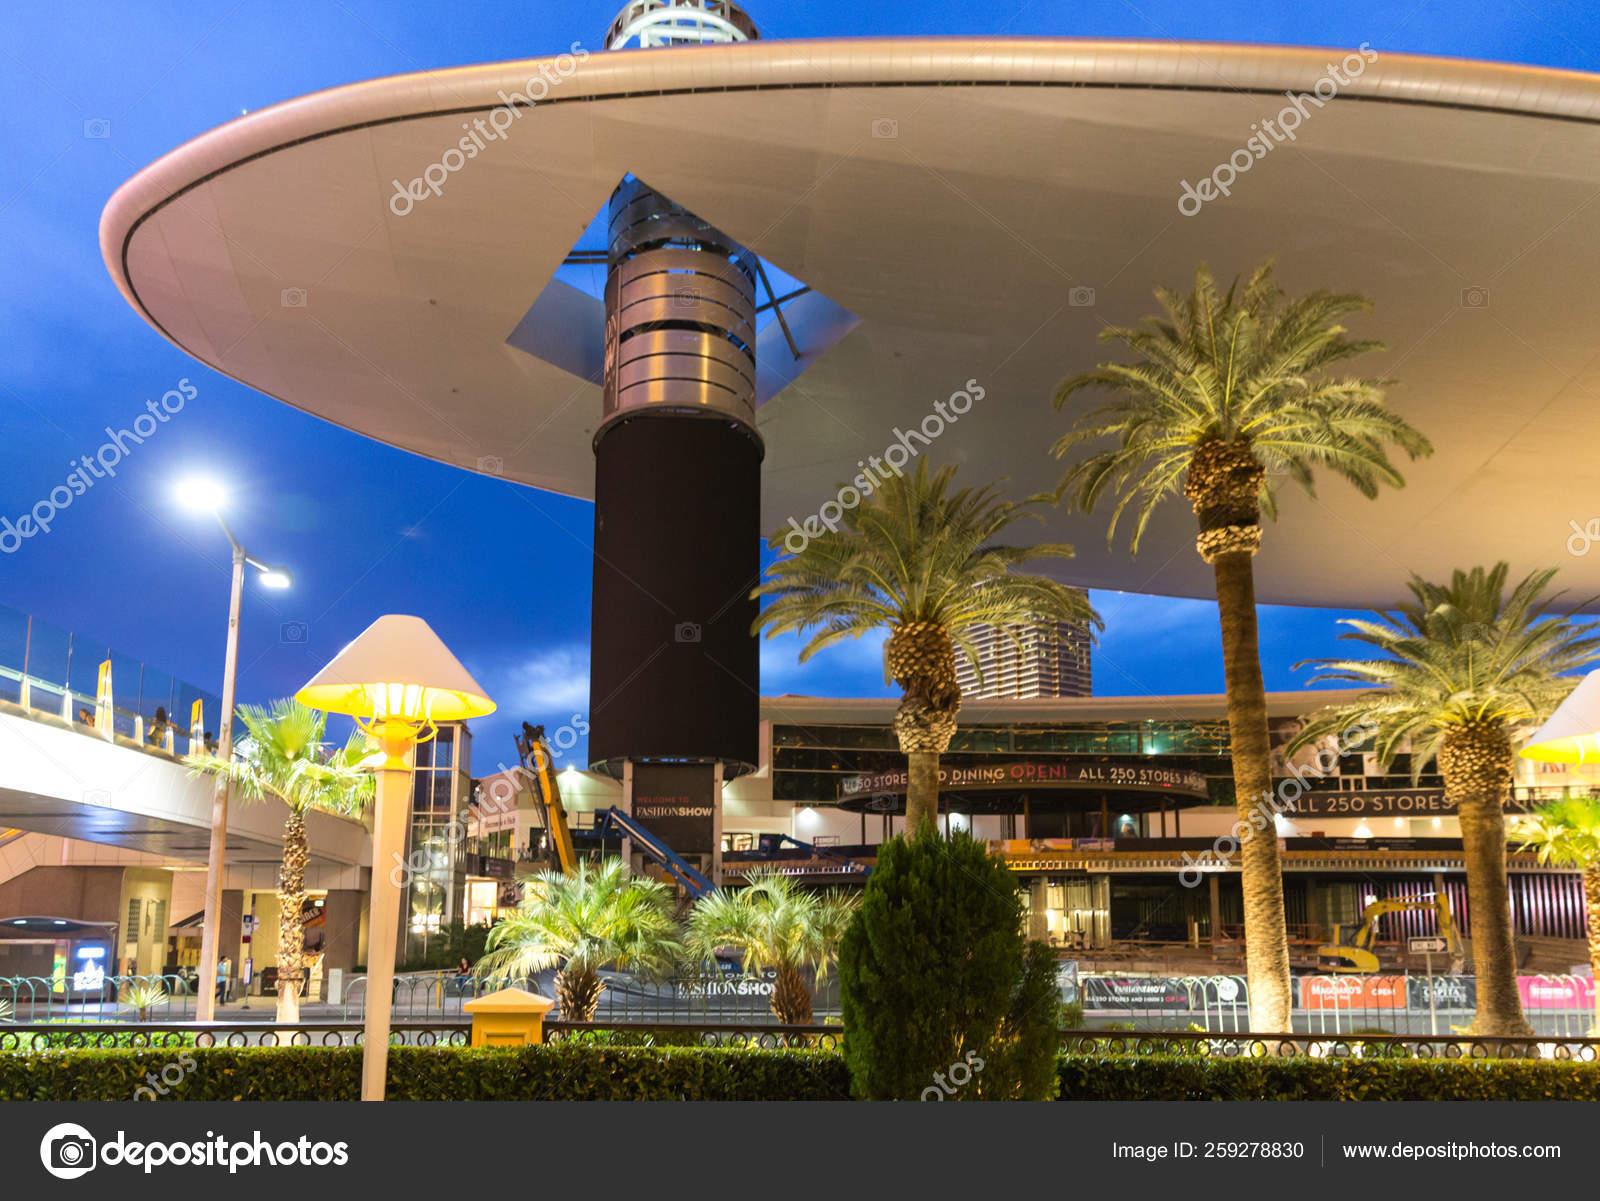 LAS VEGAS , MAY 29, 2015 Fashion Show Mall in Las Vegas at